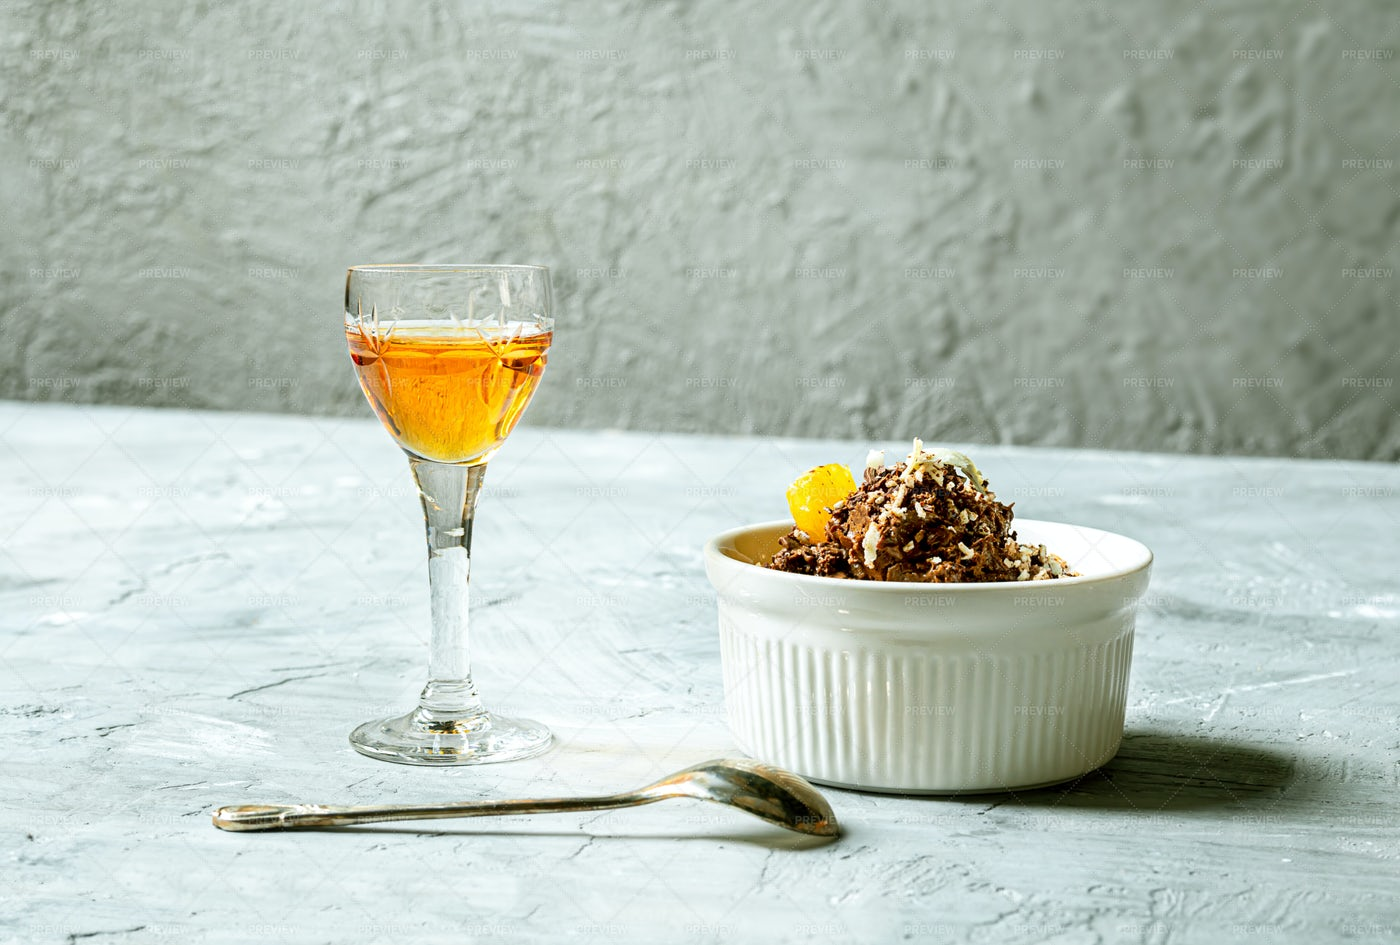 Tangerine Liqueur And Dessert: Stock Photos